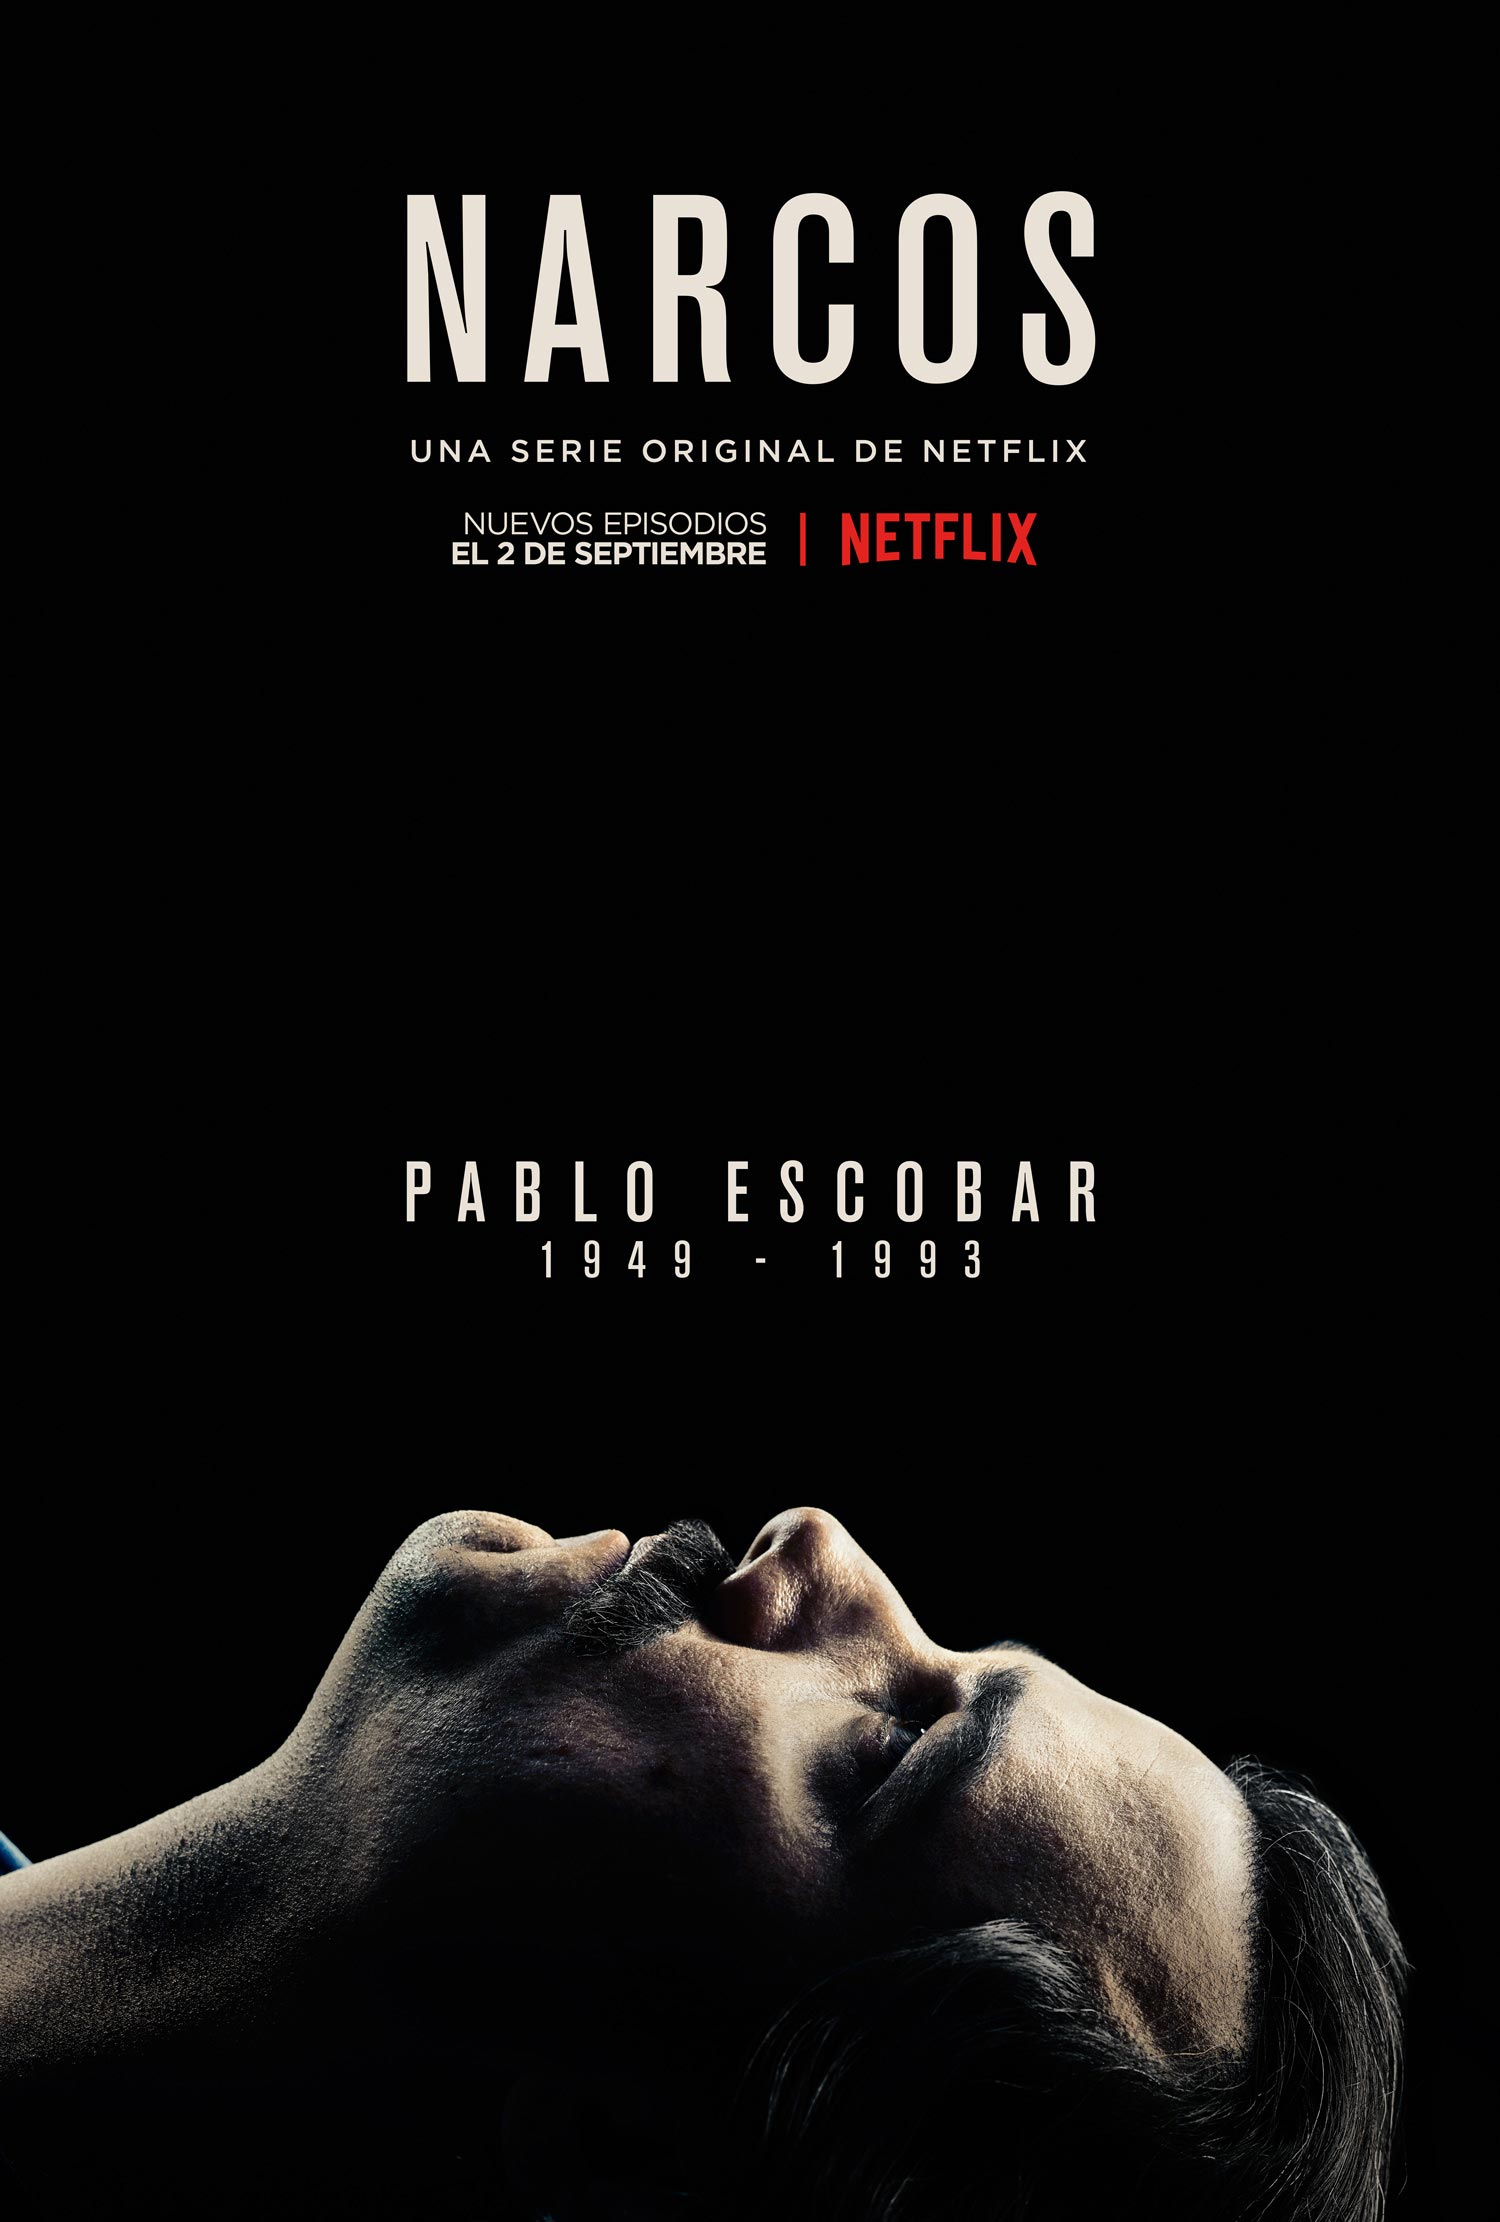 Narcos - Pablo Escobar